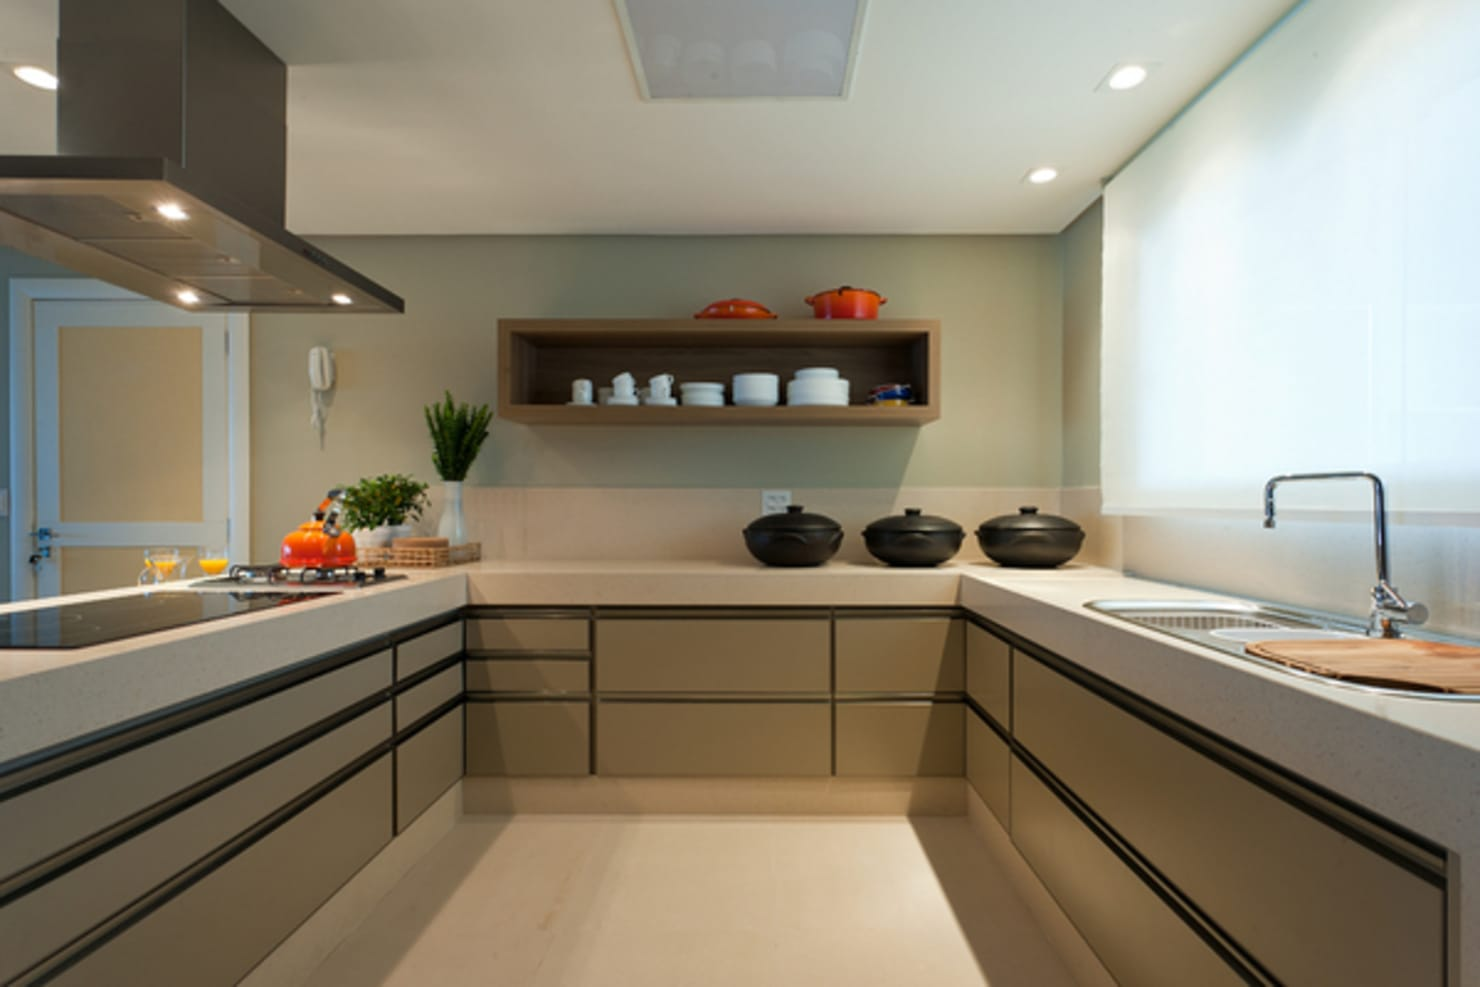 47 usos para o bicarbonato de sódio na casa